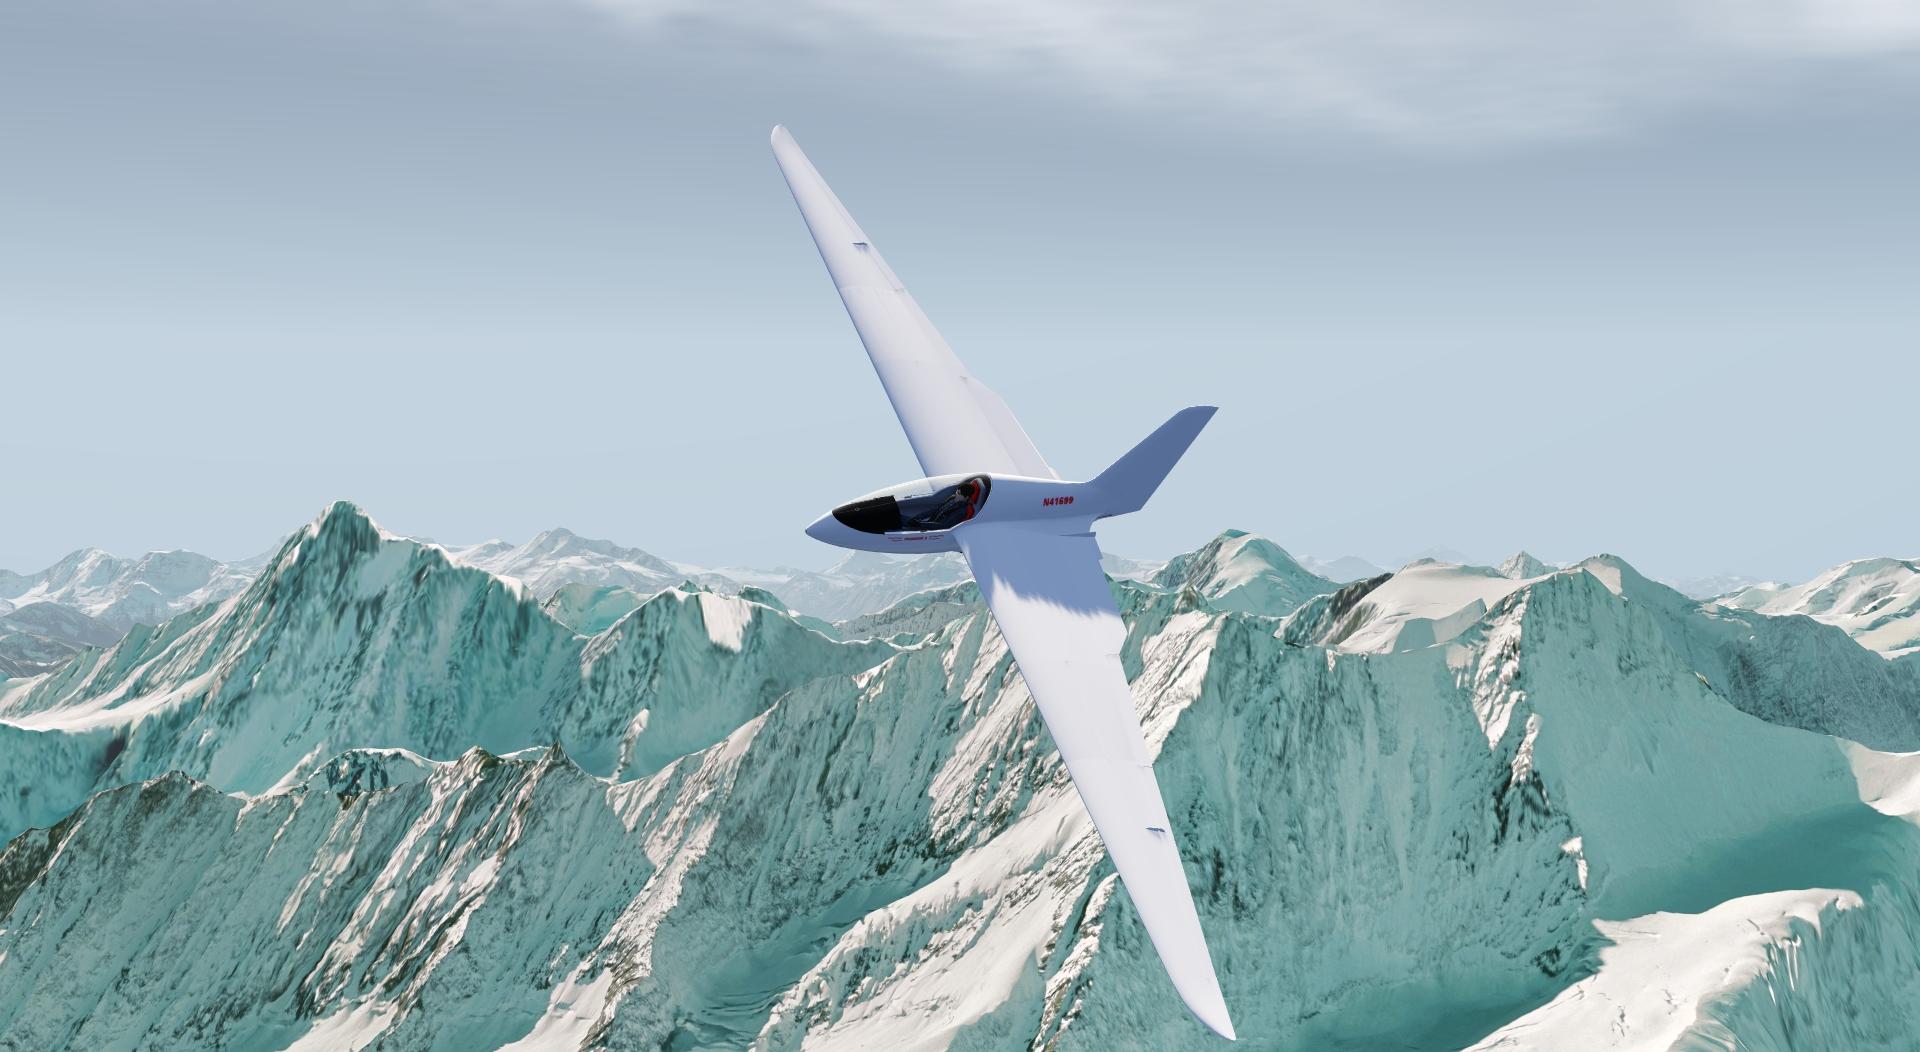 marske pioneer 3 � aerofly fs addon aircraft � aeroflysimde